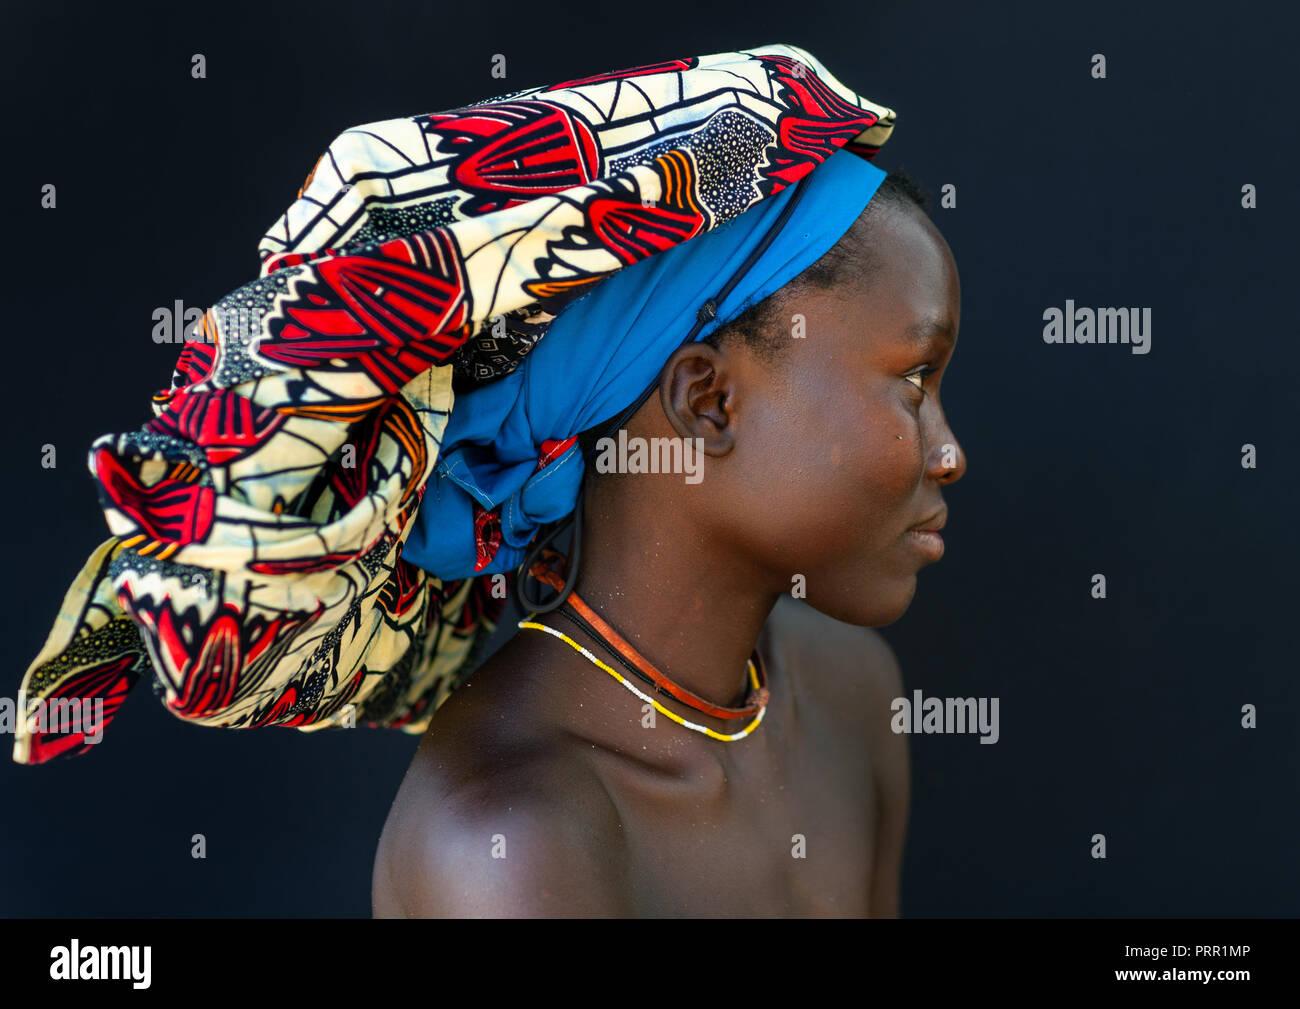 Portrait of a Mucubal tribe women wearing colorful headwears, Namibe Province, Virei, Angola Stock Photo